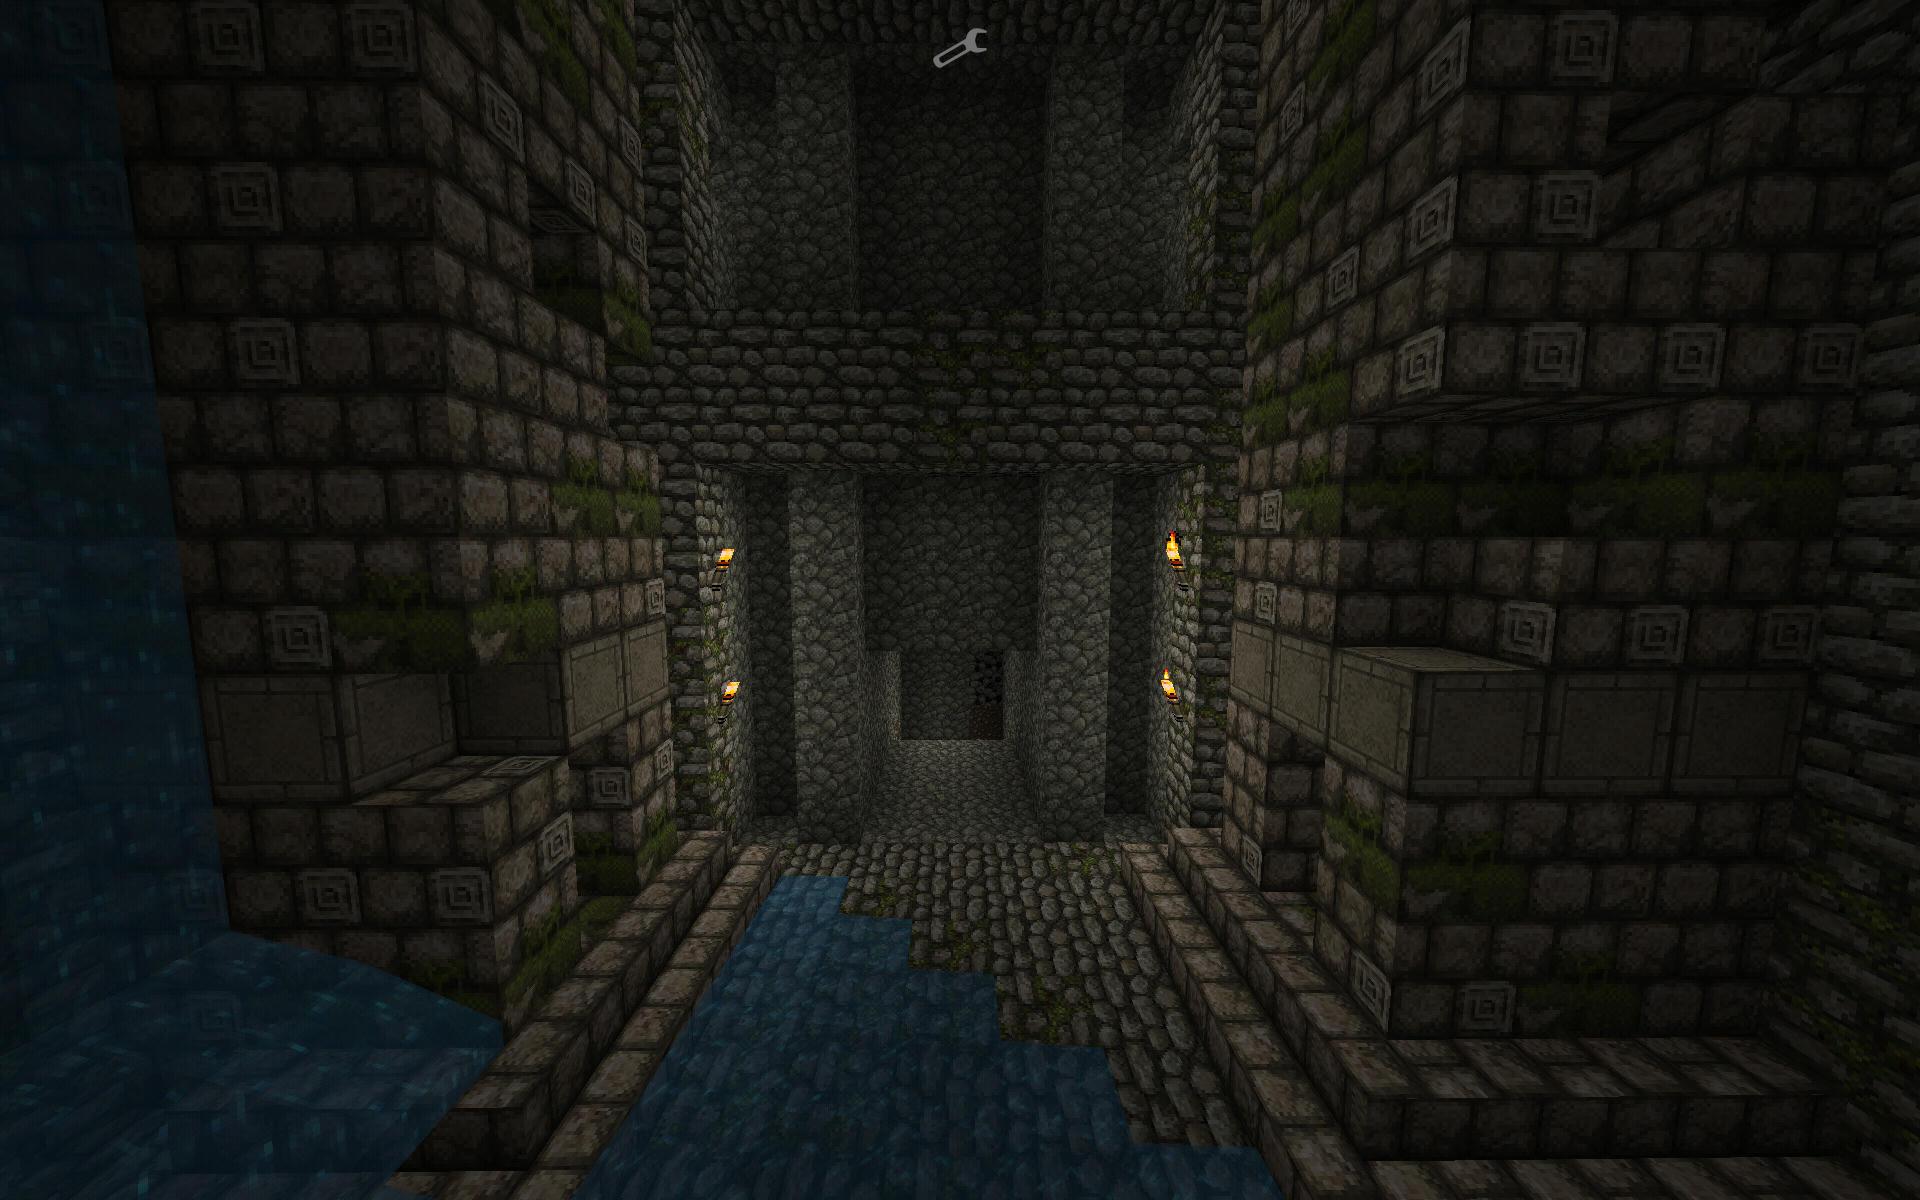 Minecraft 1 4 7 john smith texture pack download